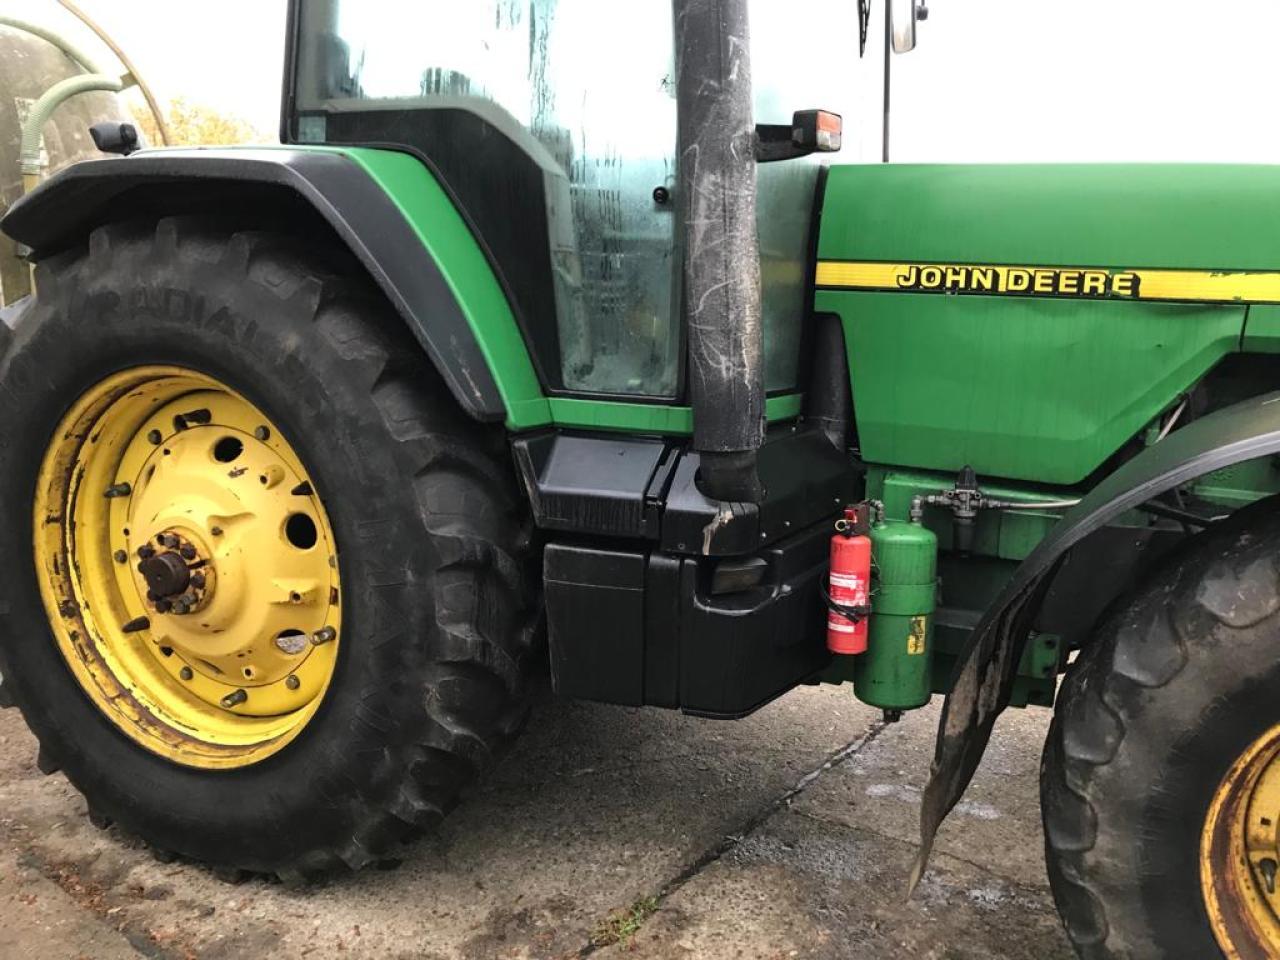 John Deere 8300 Powrshift